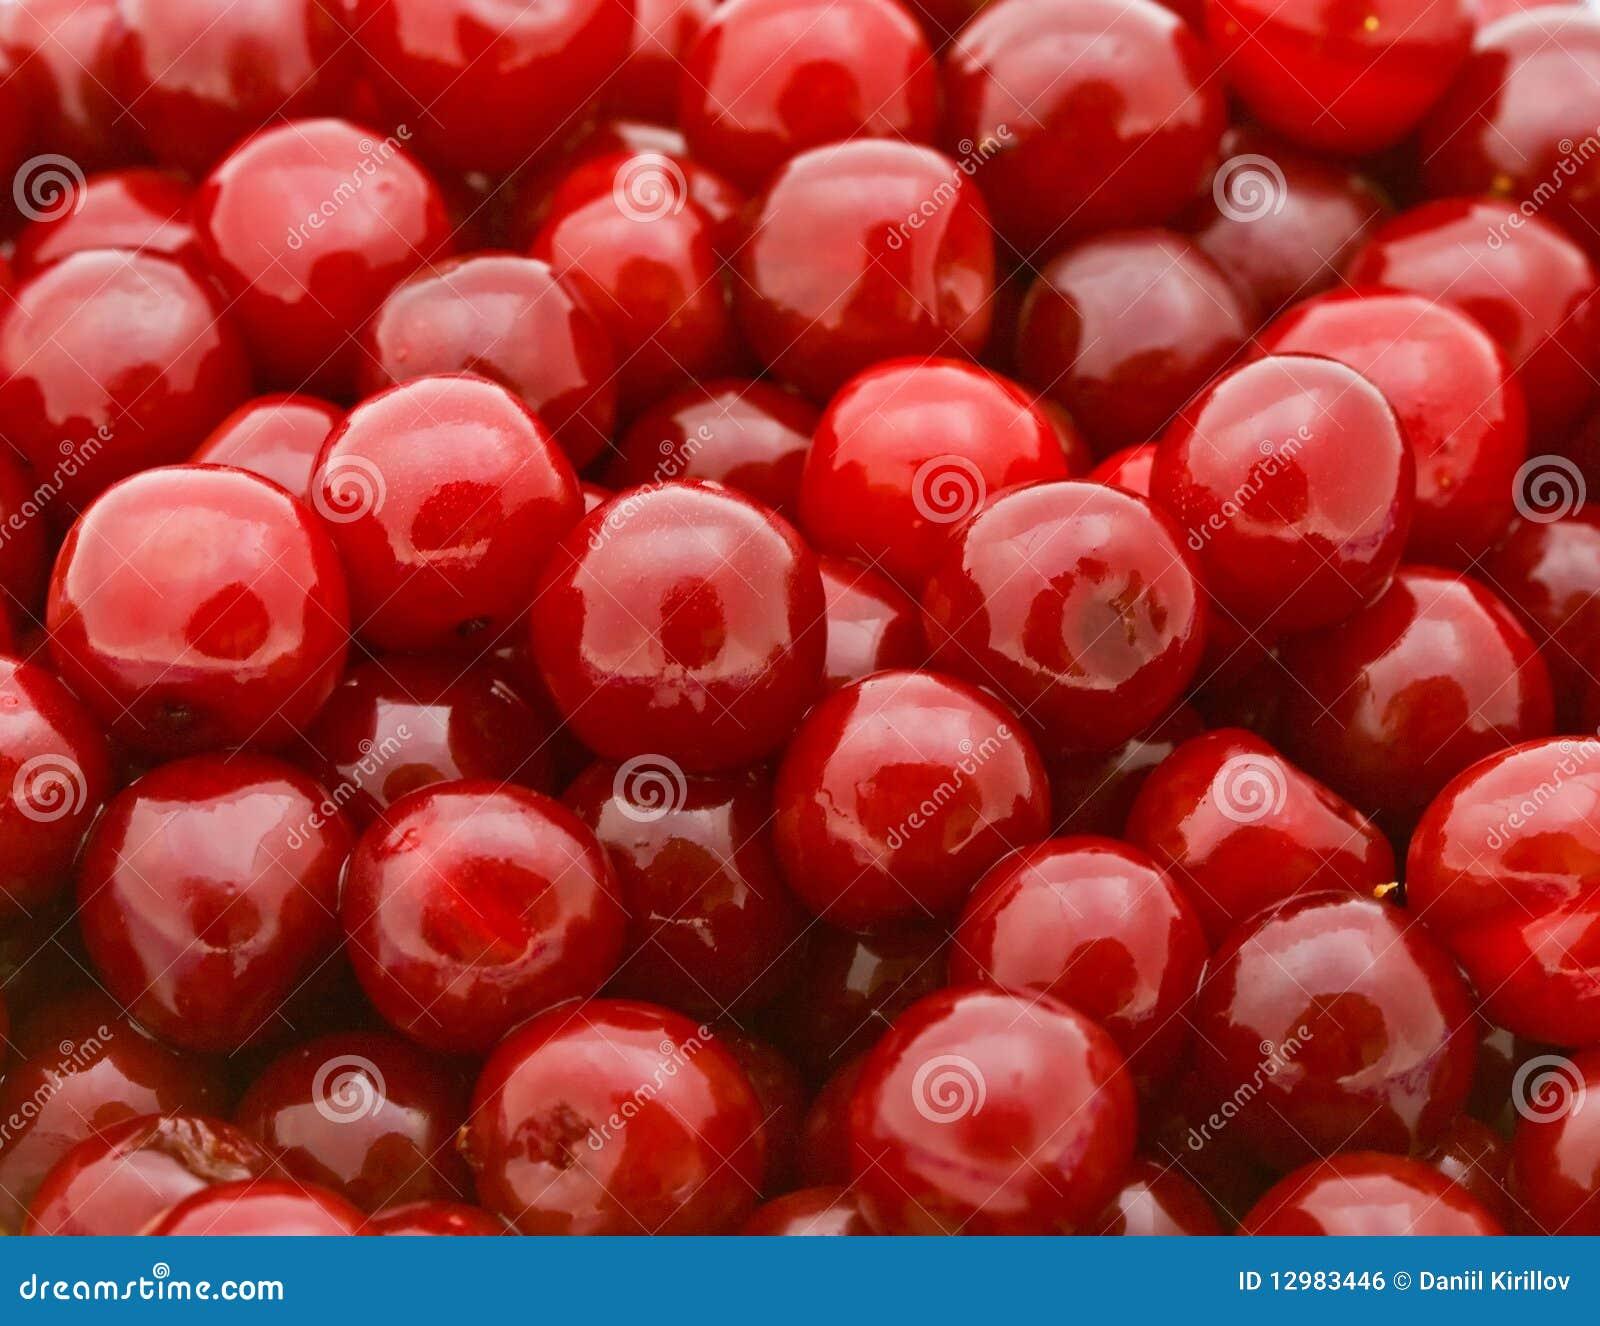 Fresh Natural Cherry Background Stock Photo - Image: 12983446